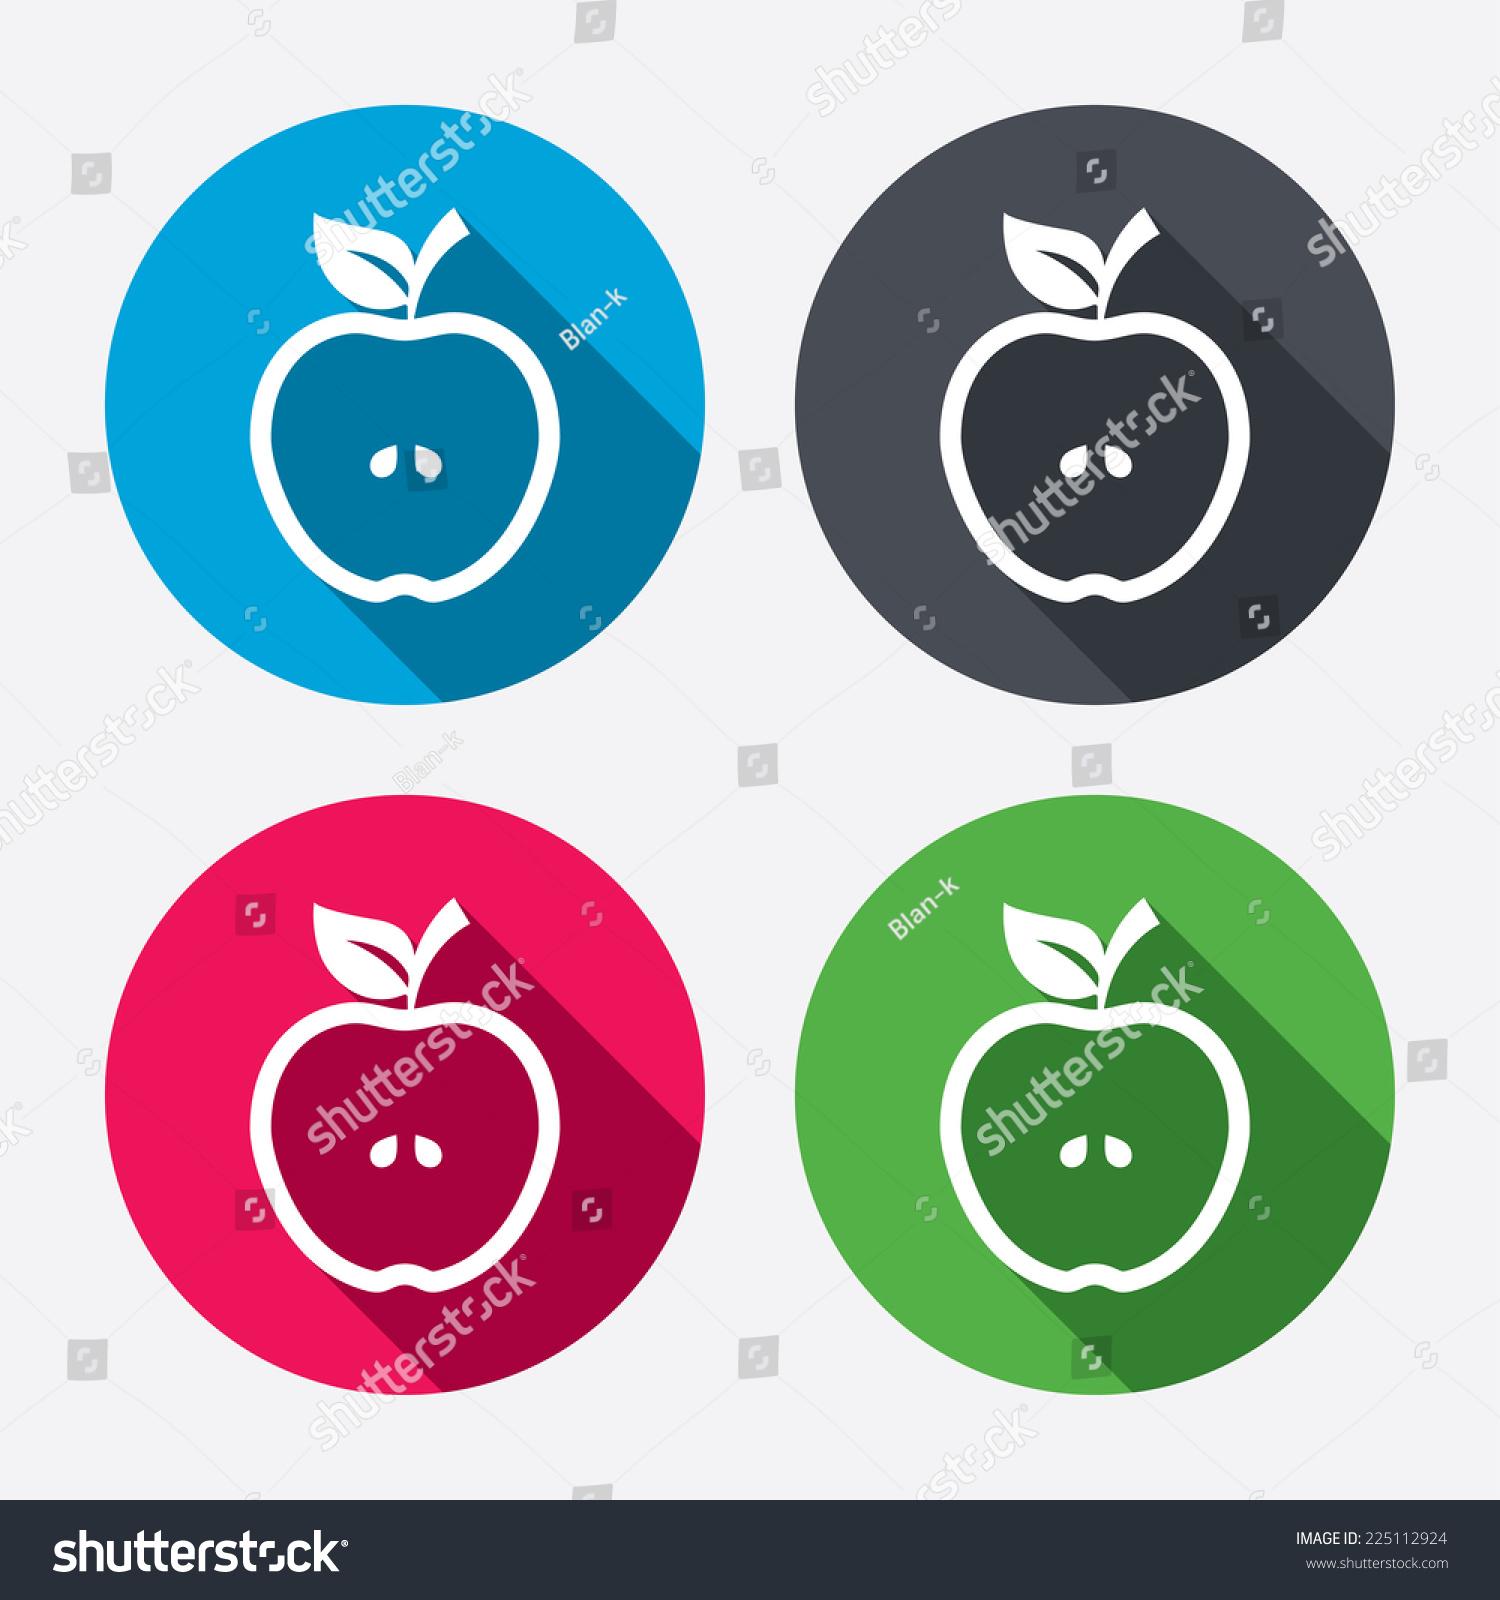 apple sign icon fruit leaf symbol stock vector 225112924 - shutterstock